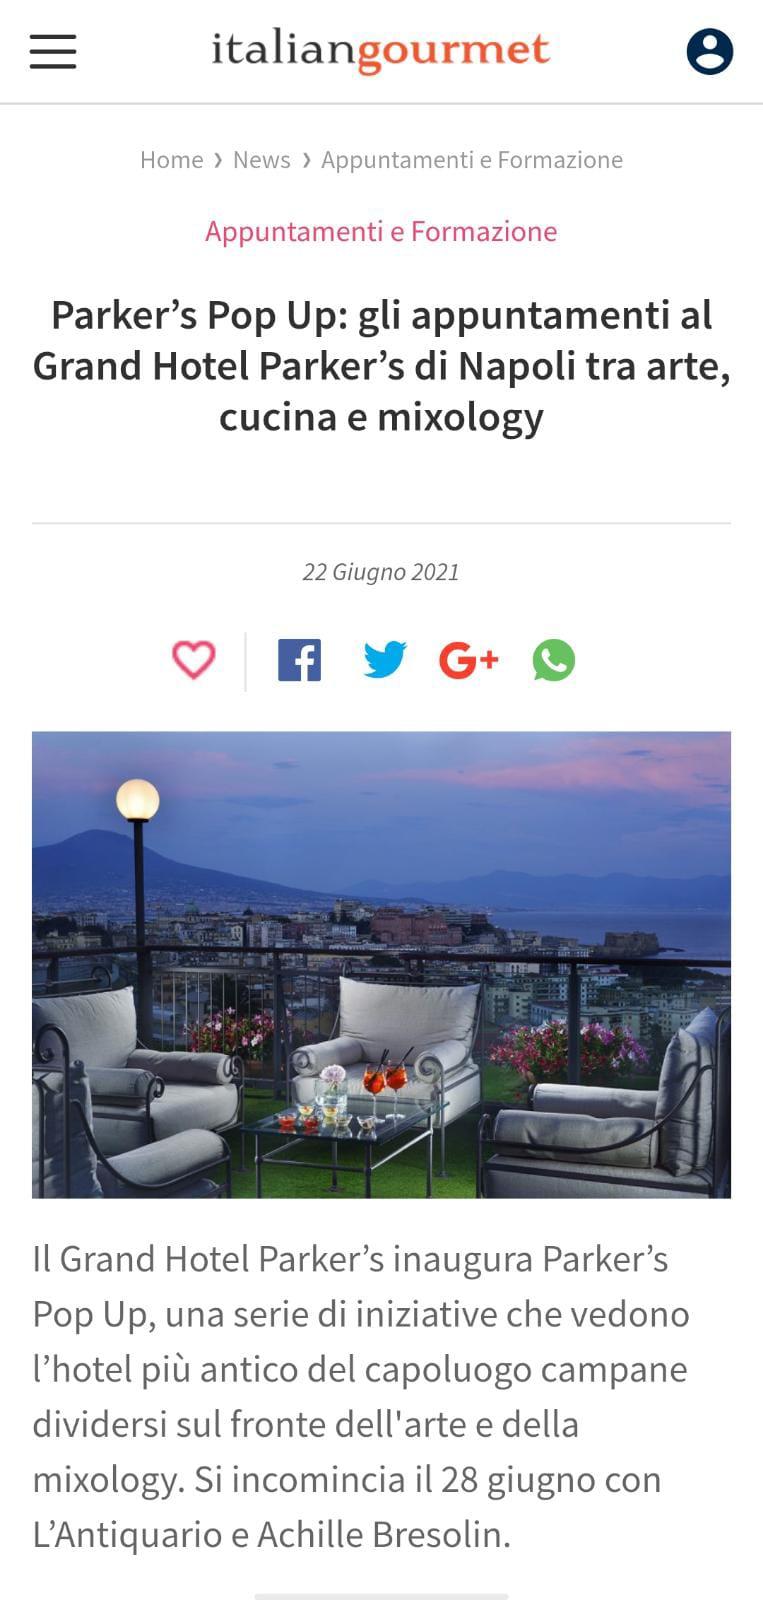 GRAND HOTEL PARKER'S – ITALIAN GOURMET – GIUGNO 2021